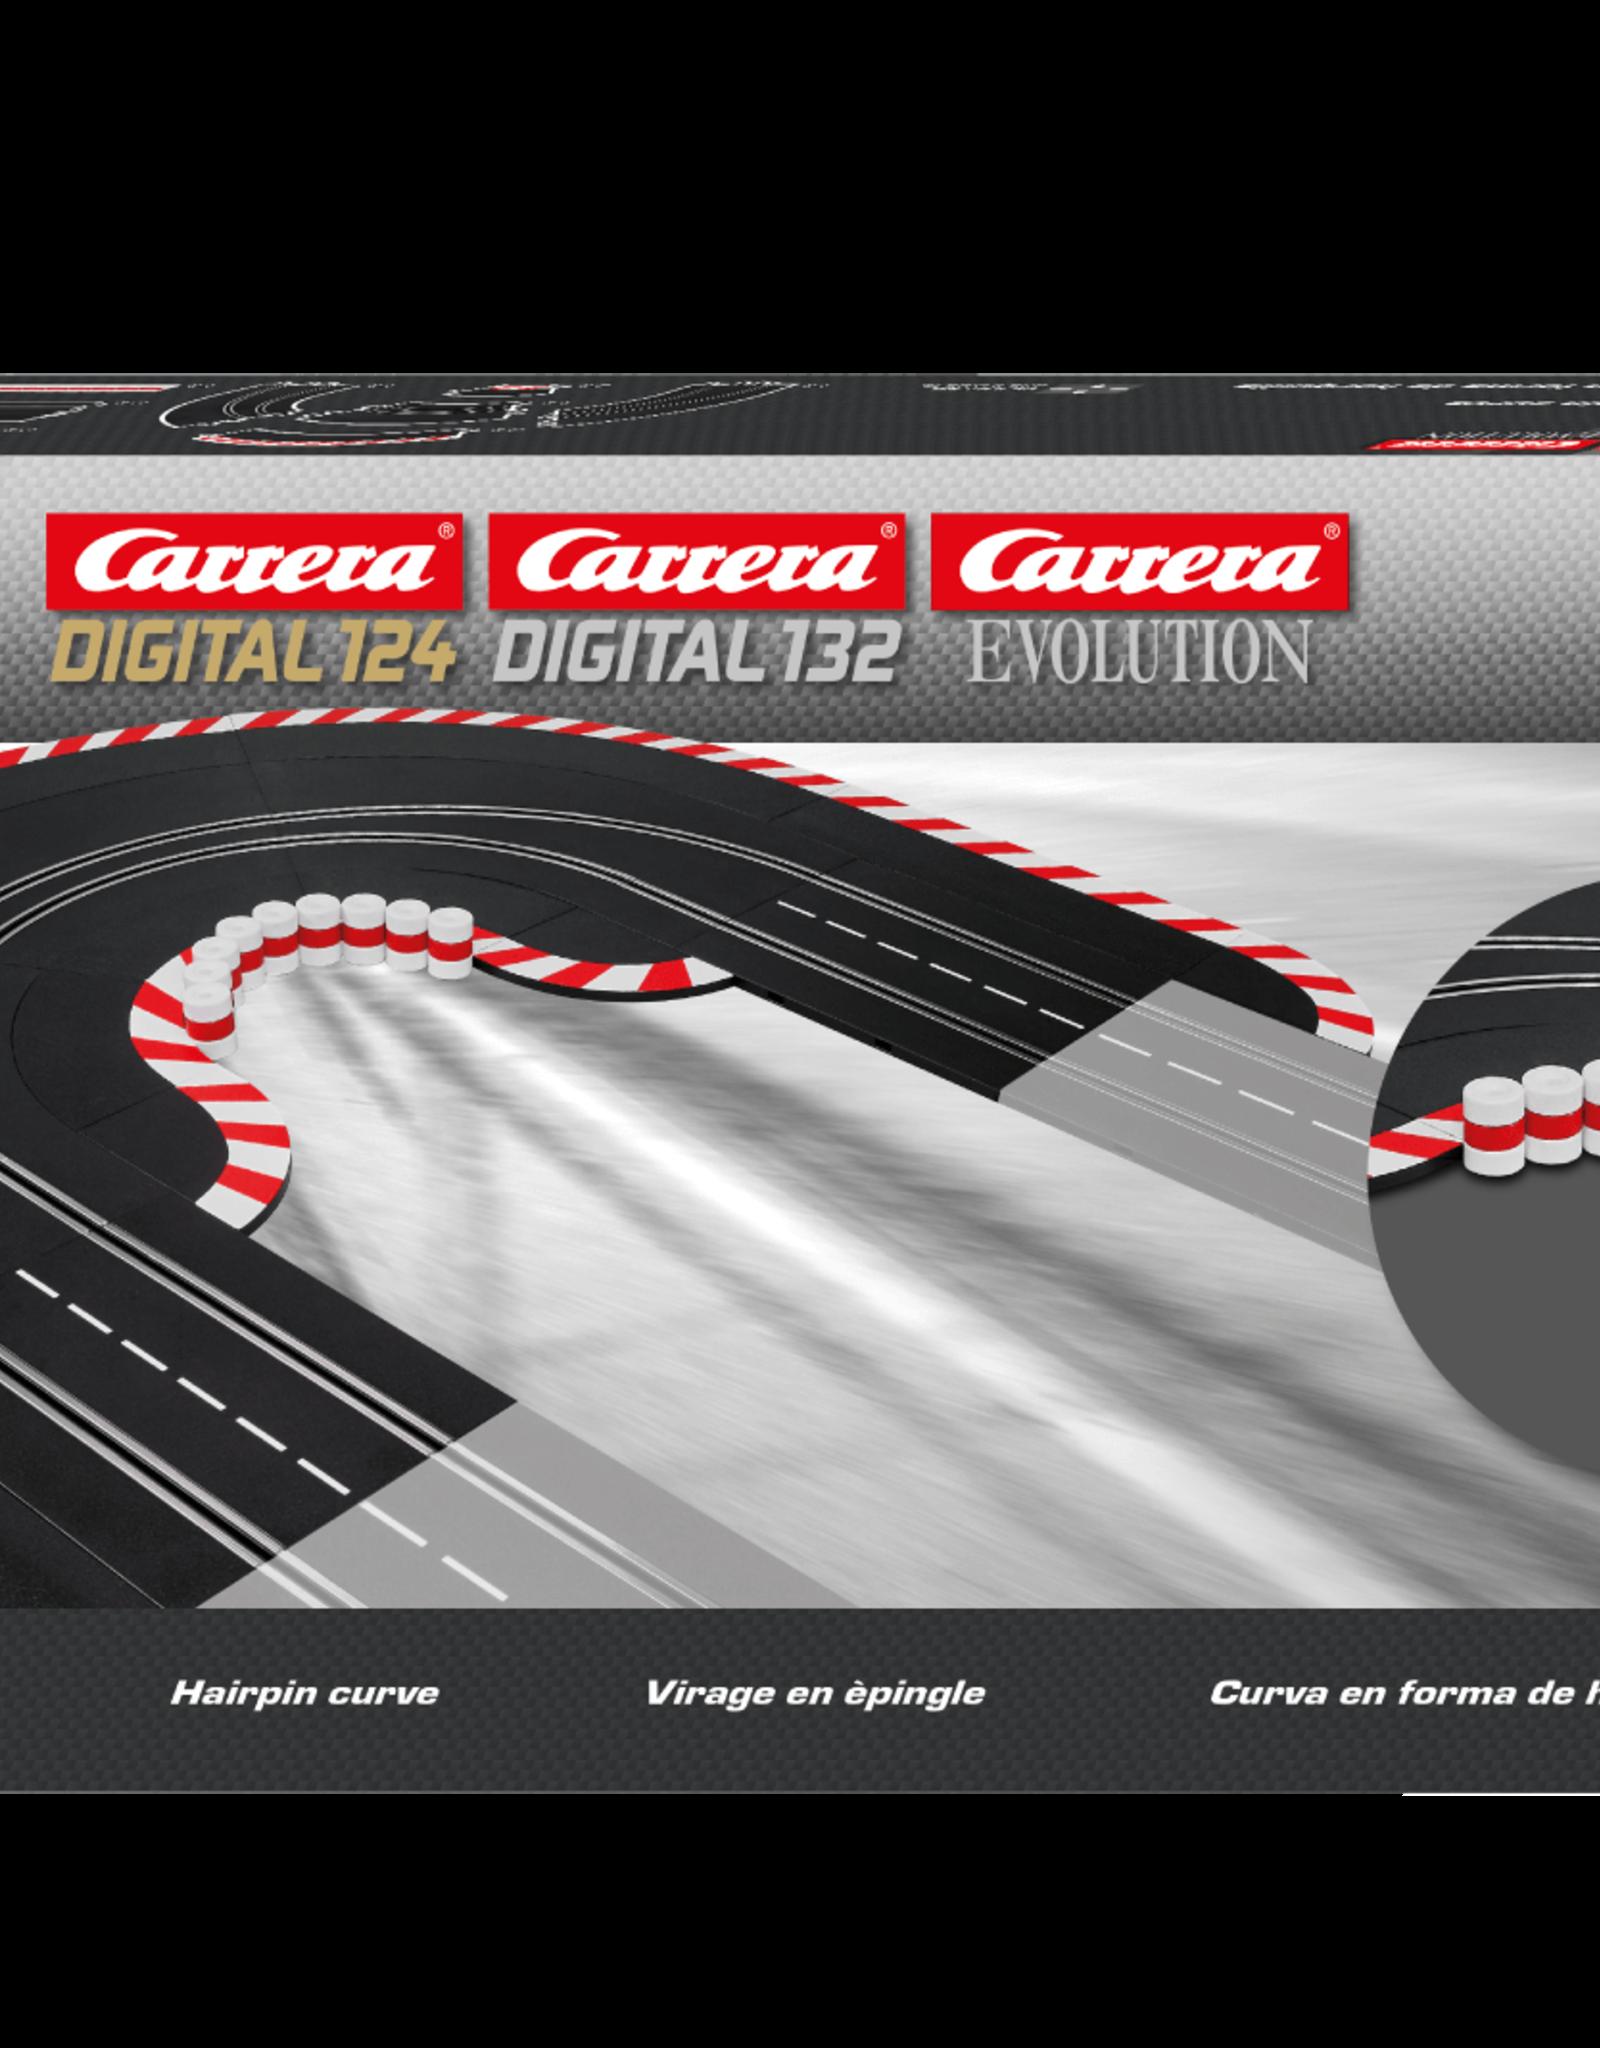 carrera CAR20613 Hairpin Curve 1/60, Digital 124/132 & Analog